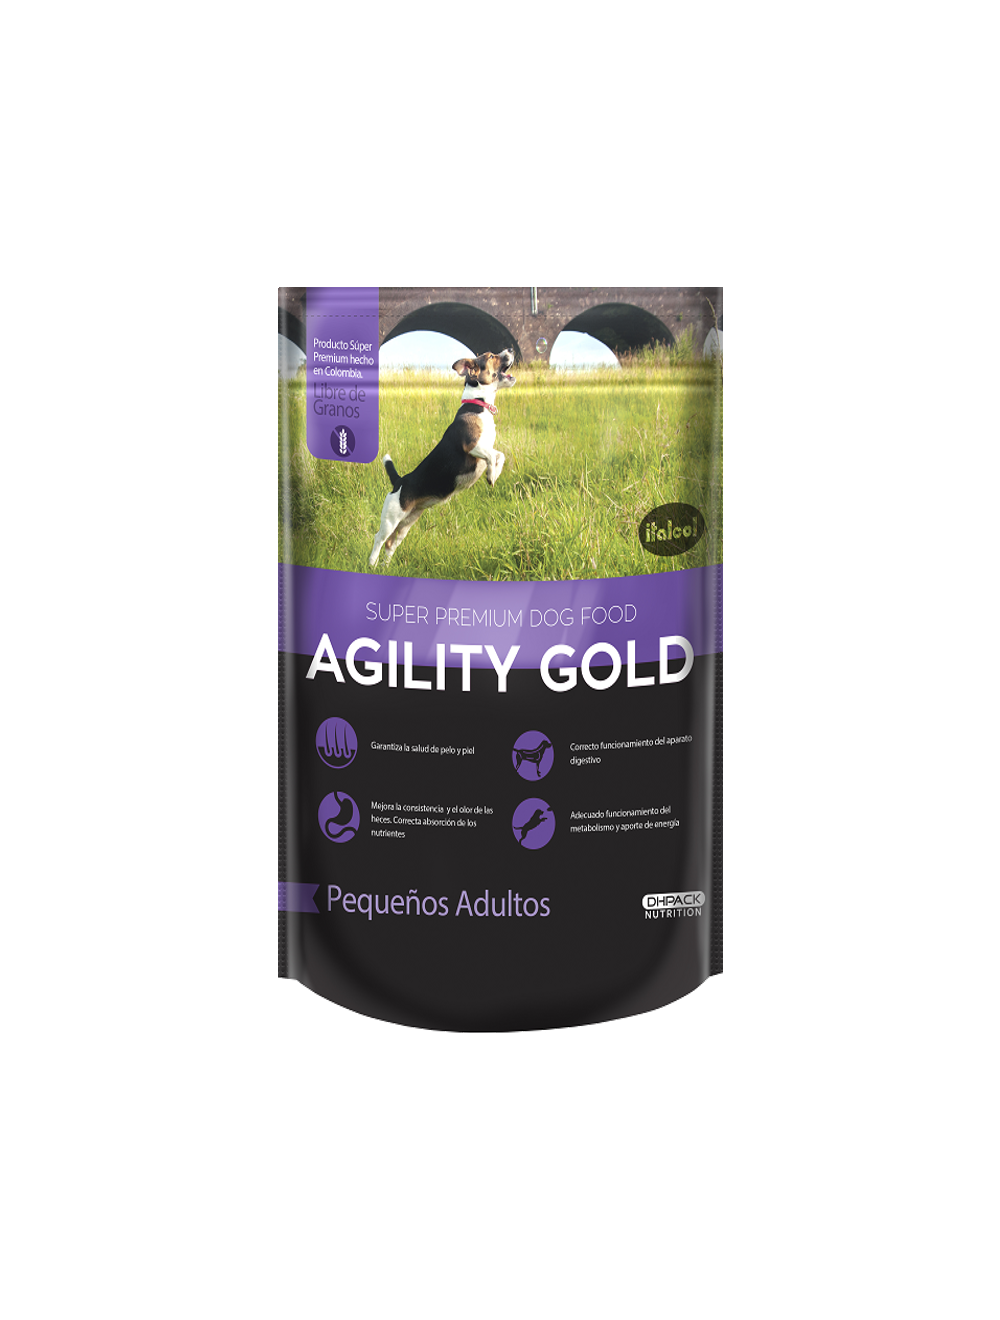 Agility Gold Pequeños Adultos x 1.5 Kg - P80